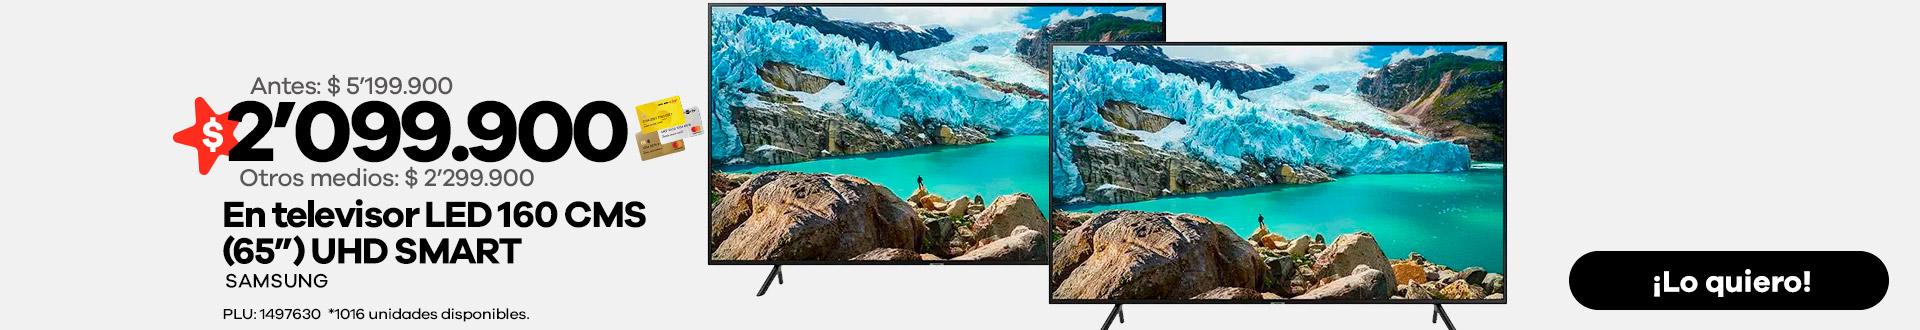 televisor-led-samsung-49-pulgadas-full-hd-smart-tv-serie-5-